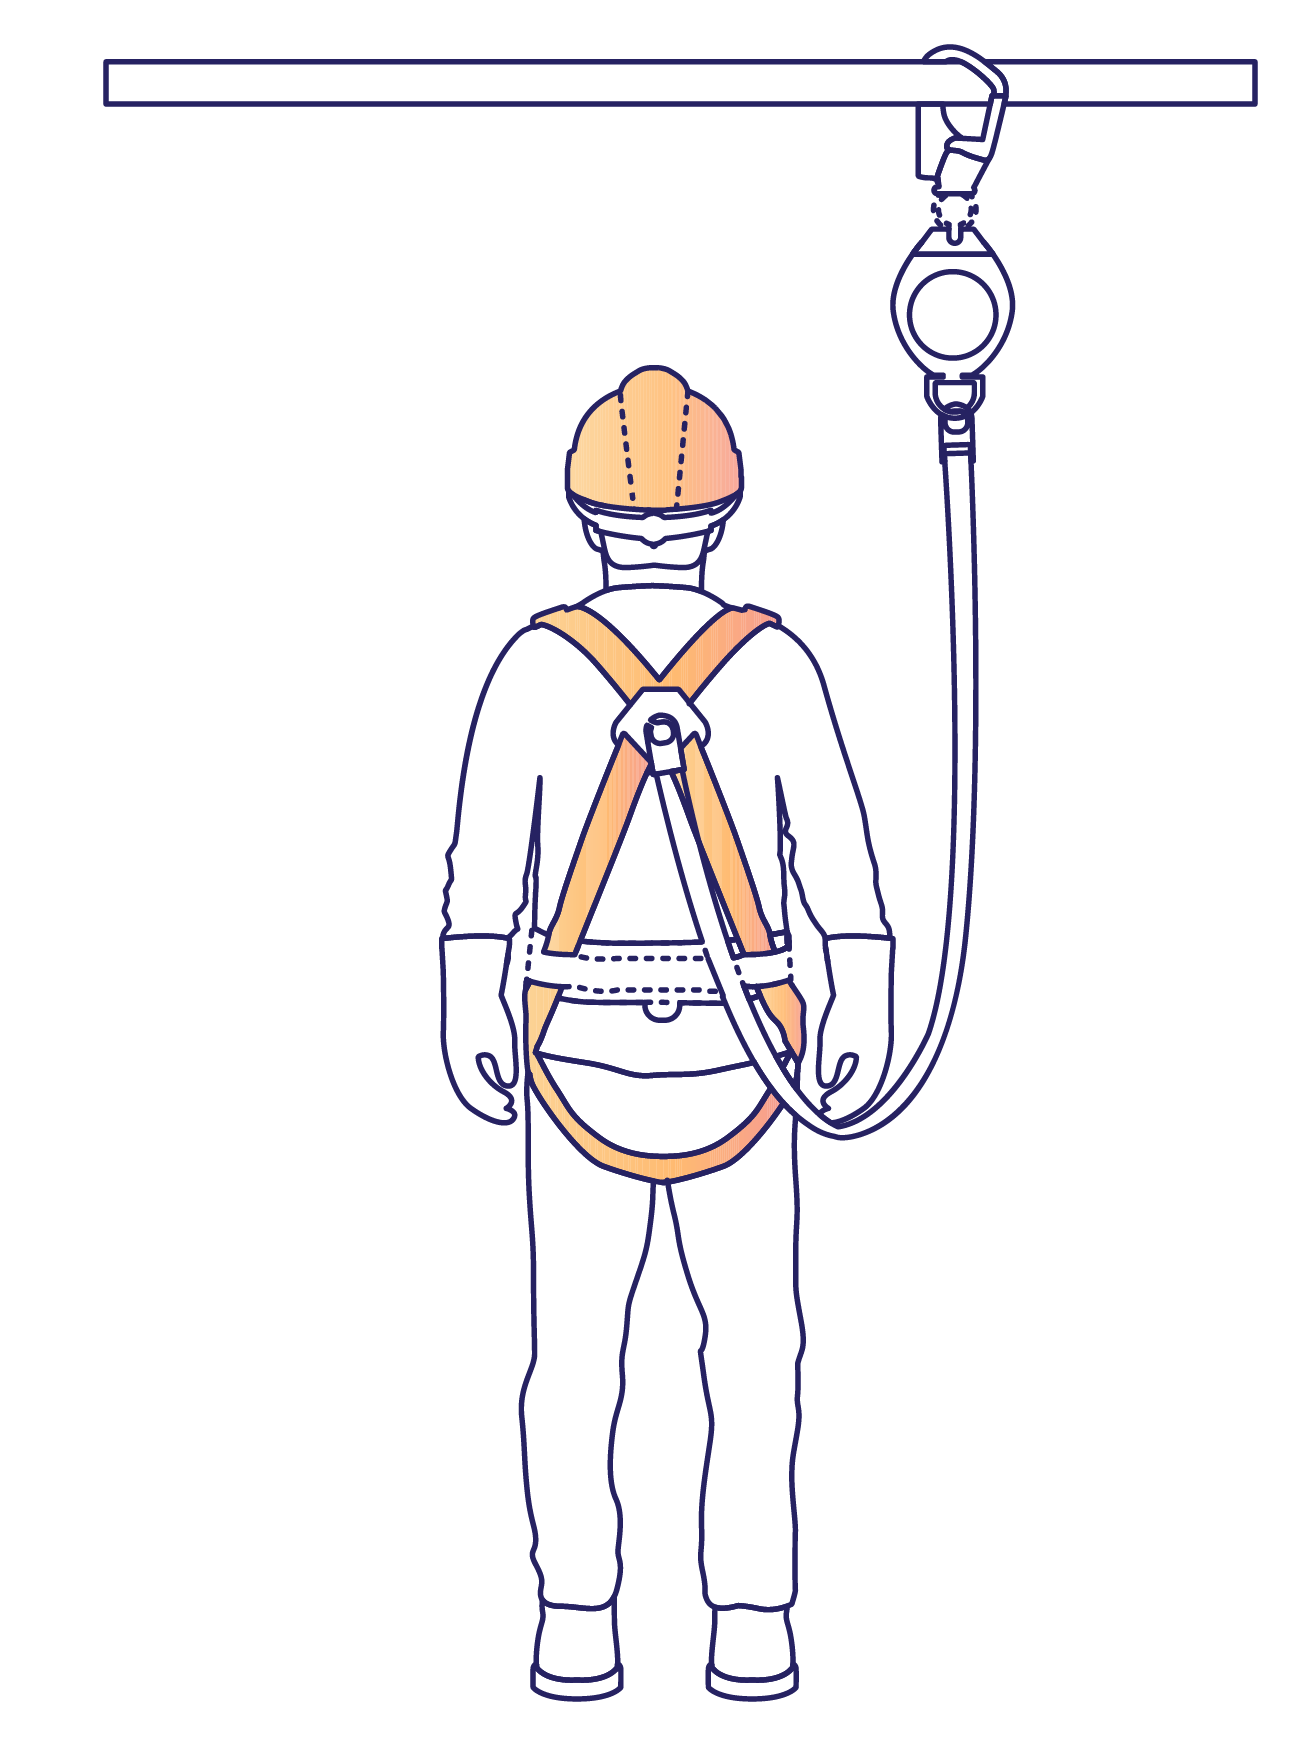 Principal Contractor / Construction Safety